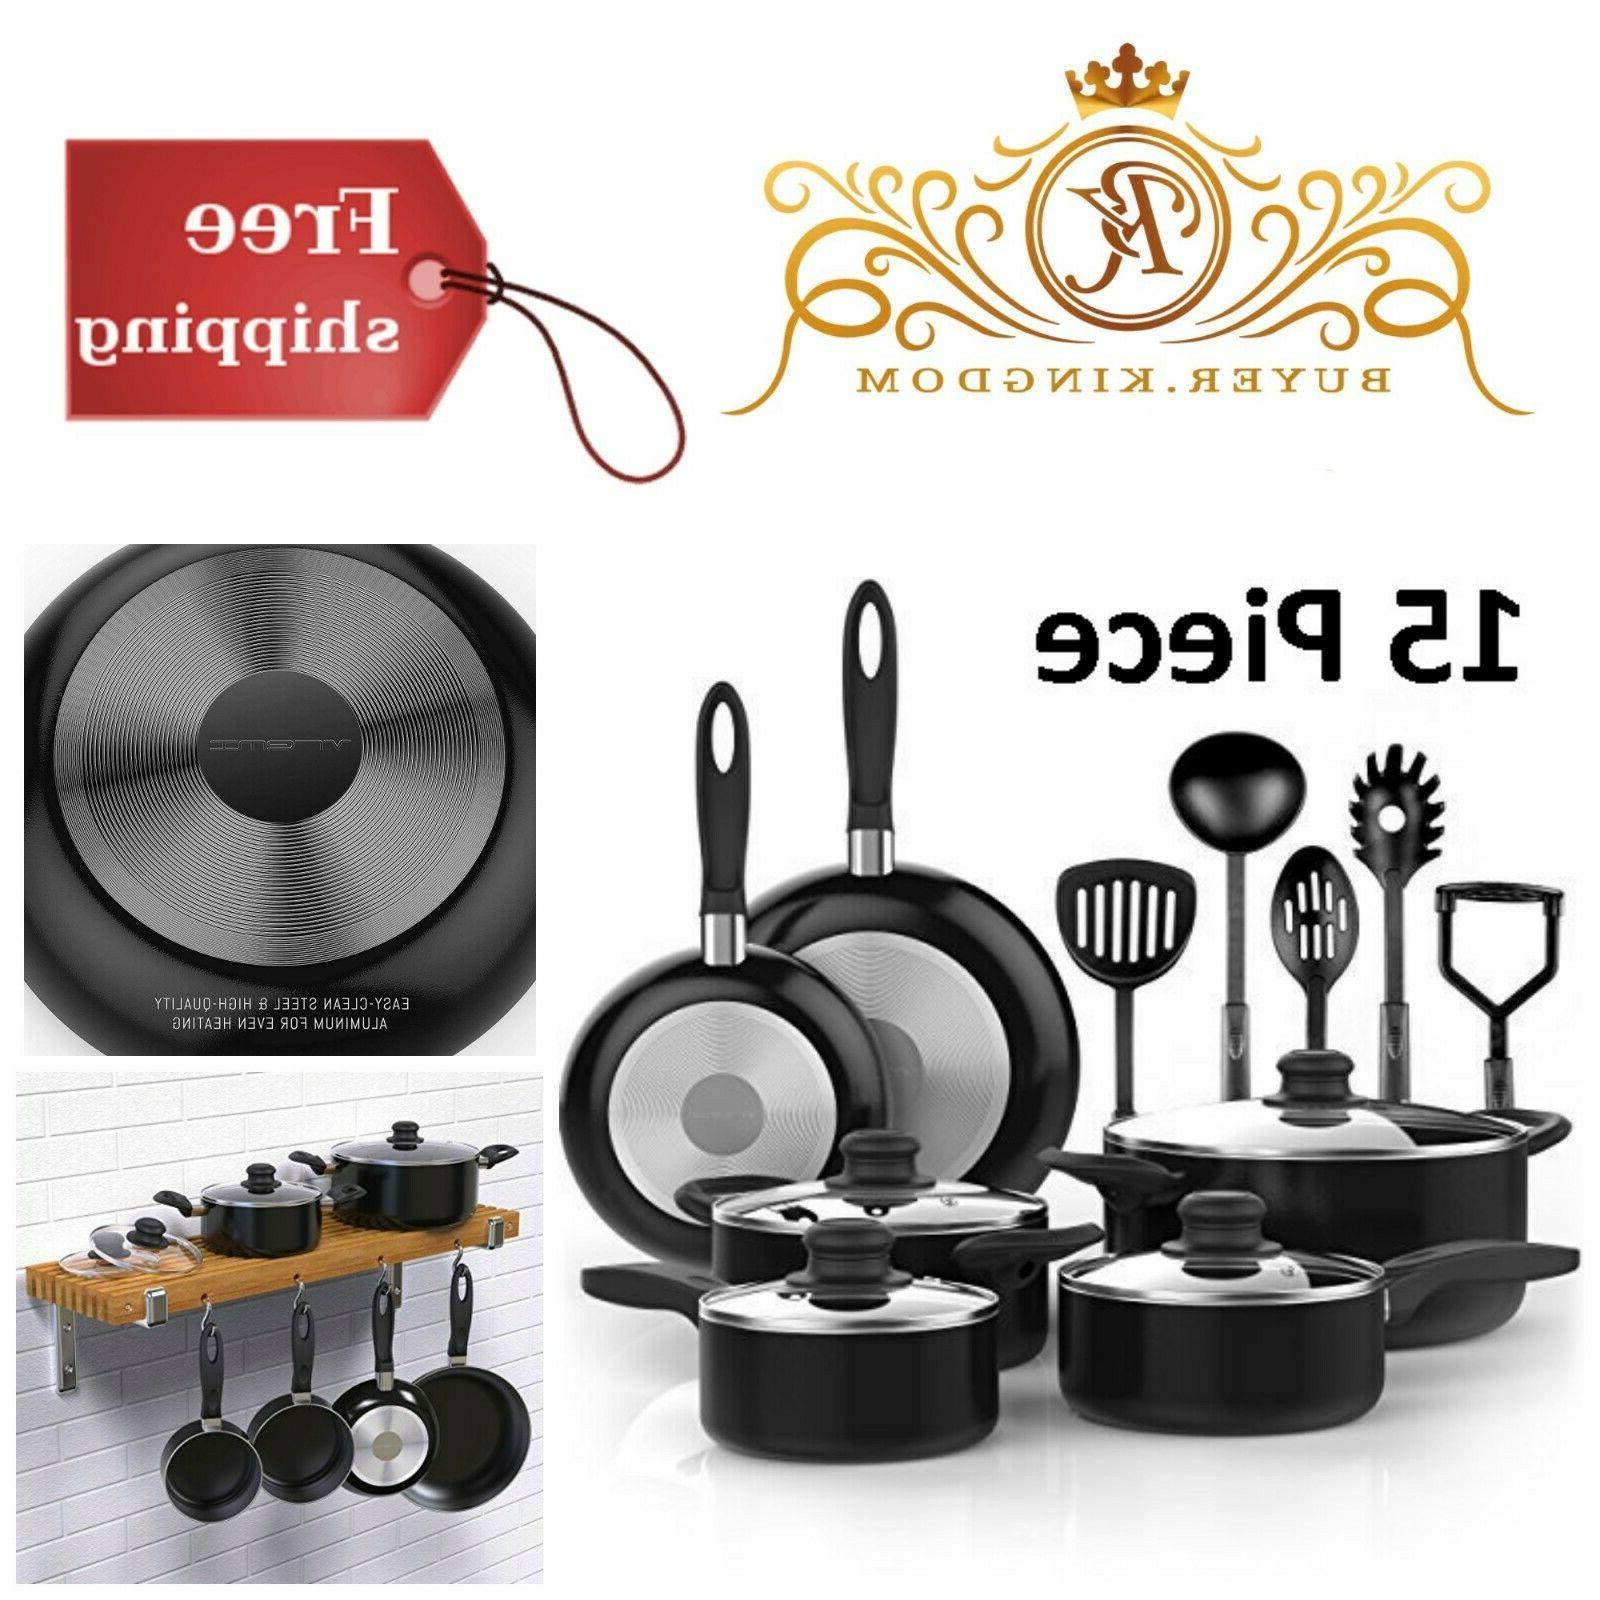 Nonstick Cookware Set With Saucepans Dutch Ovens Lids Fry Pa